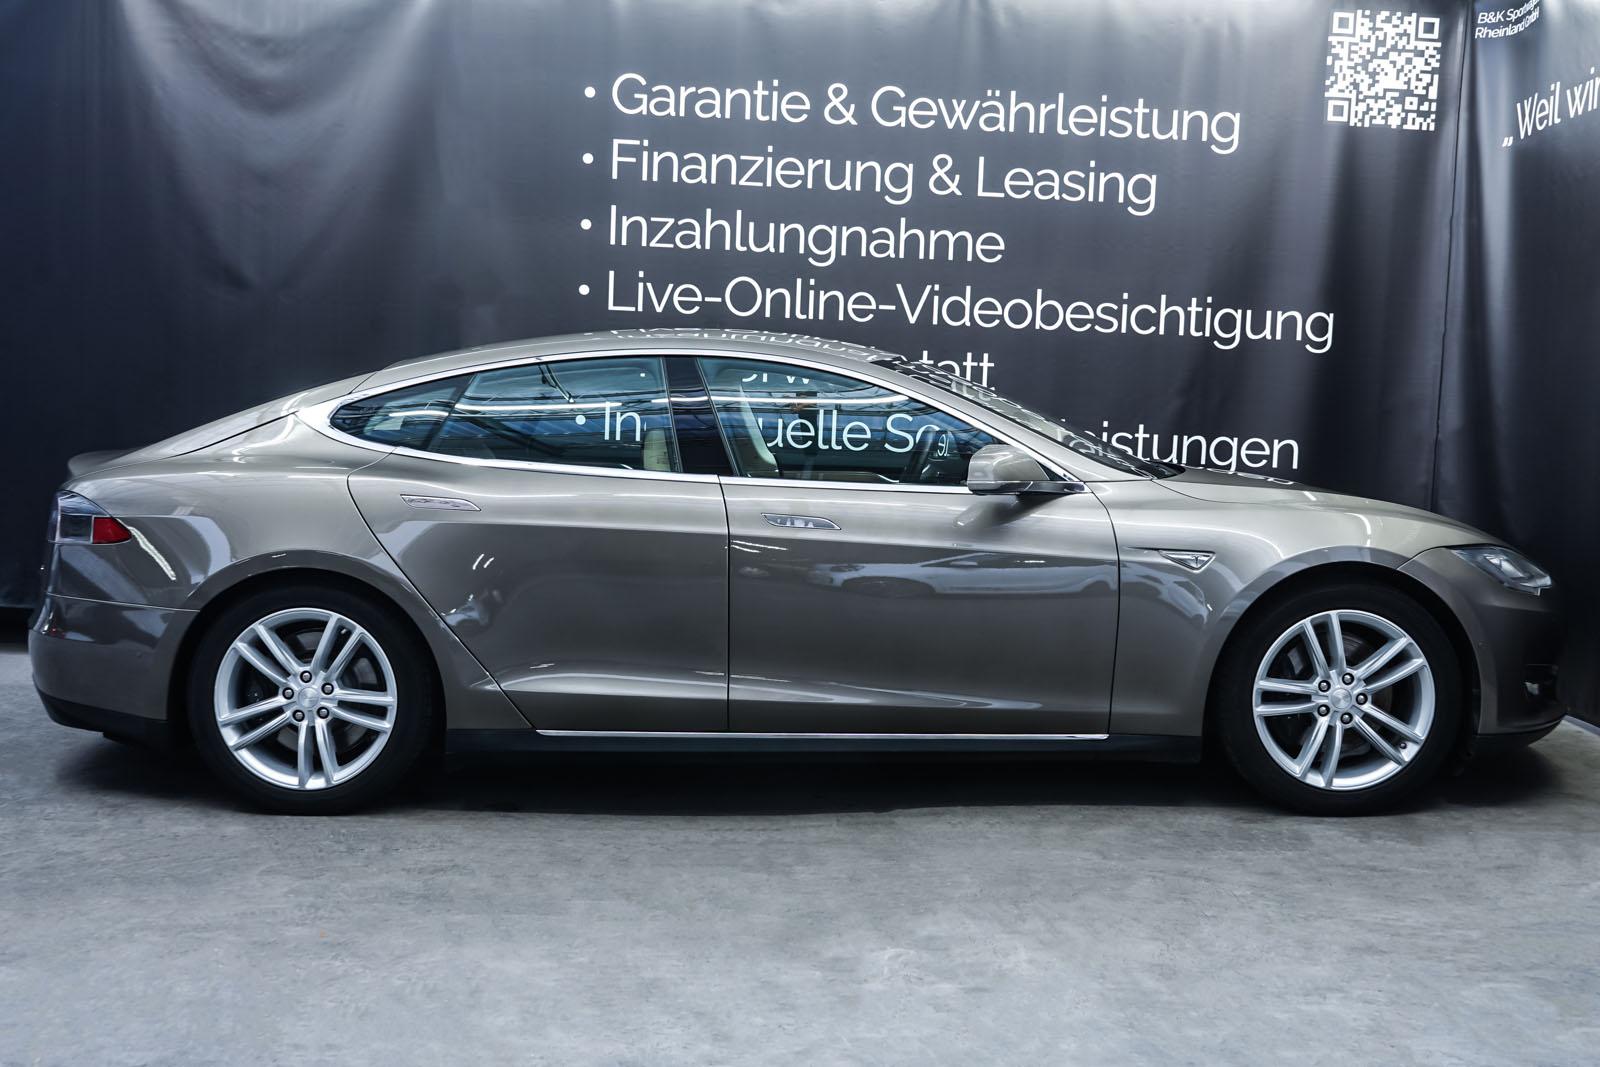 Tesla_ModelS85D_TitaniumMetallic_Beige_Tes-2897_15_w